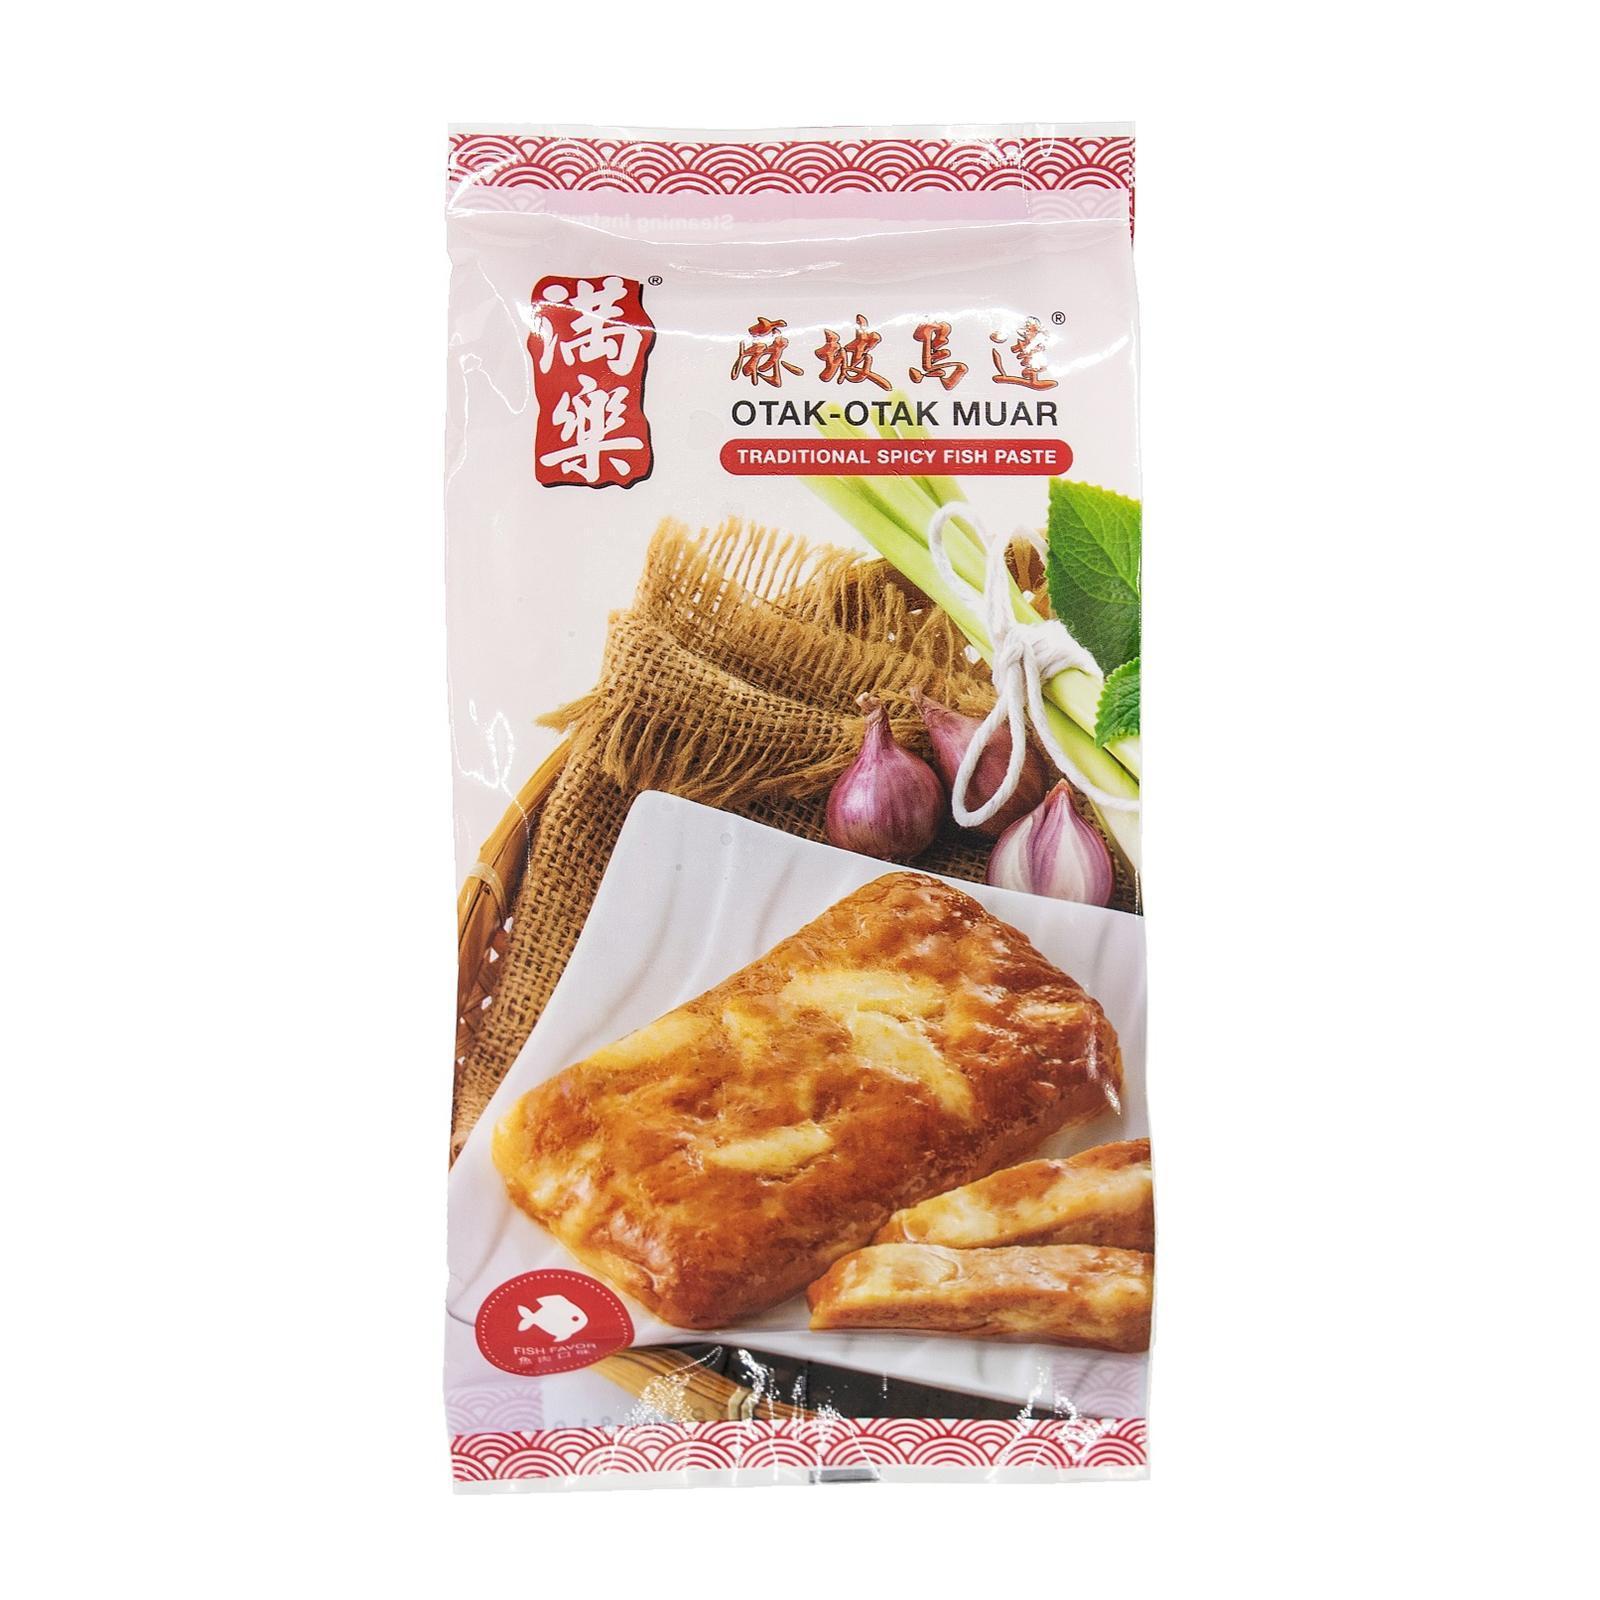 Muaria Otak Spicy Fish Paste - Frozen